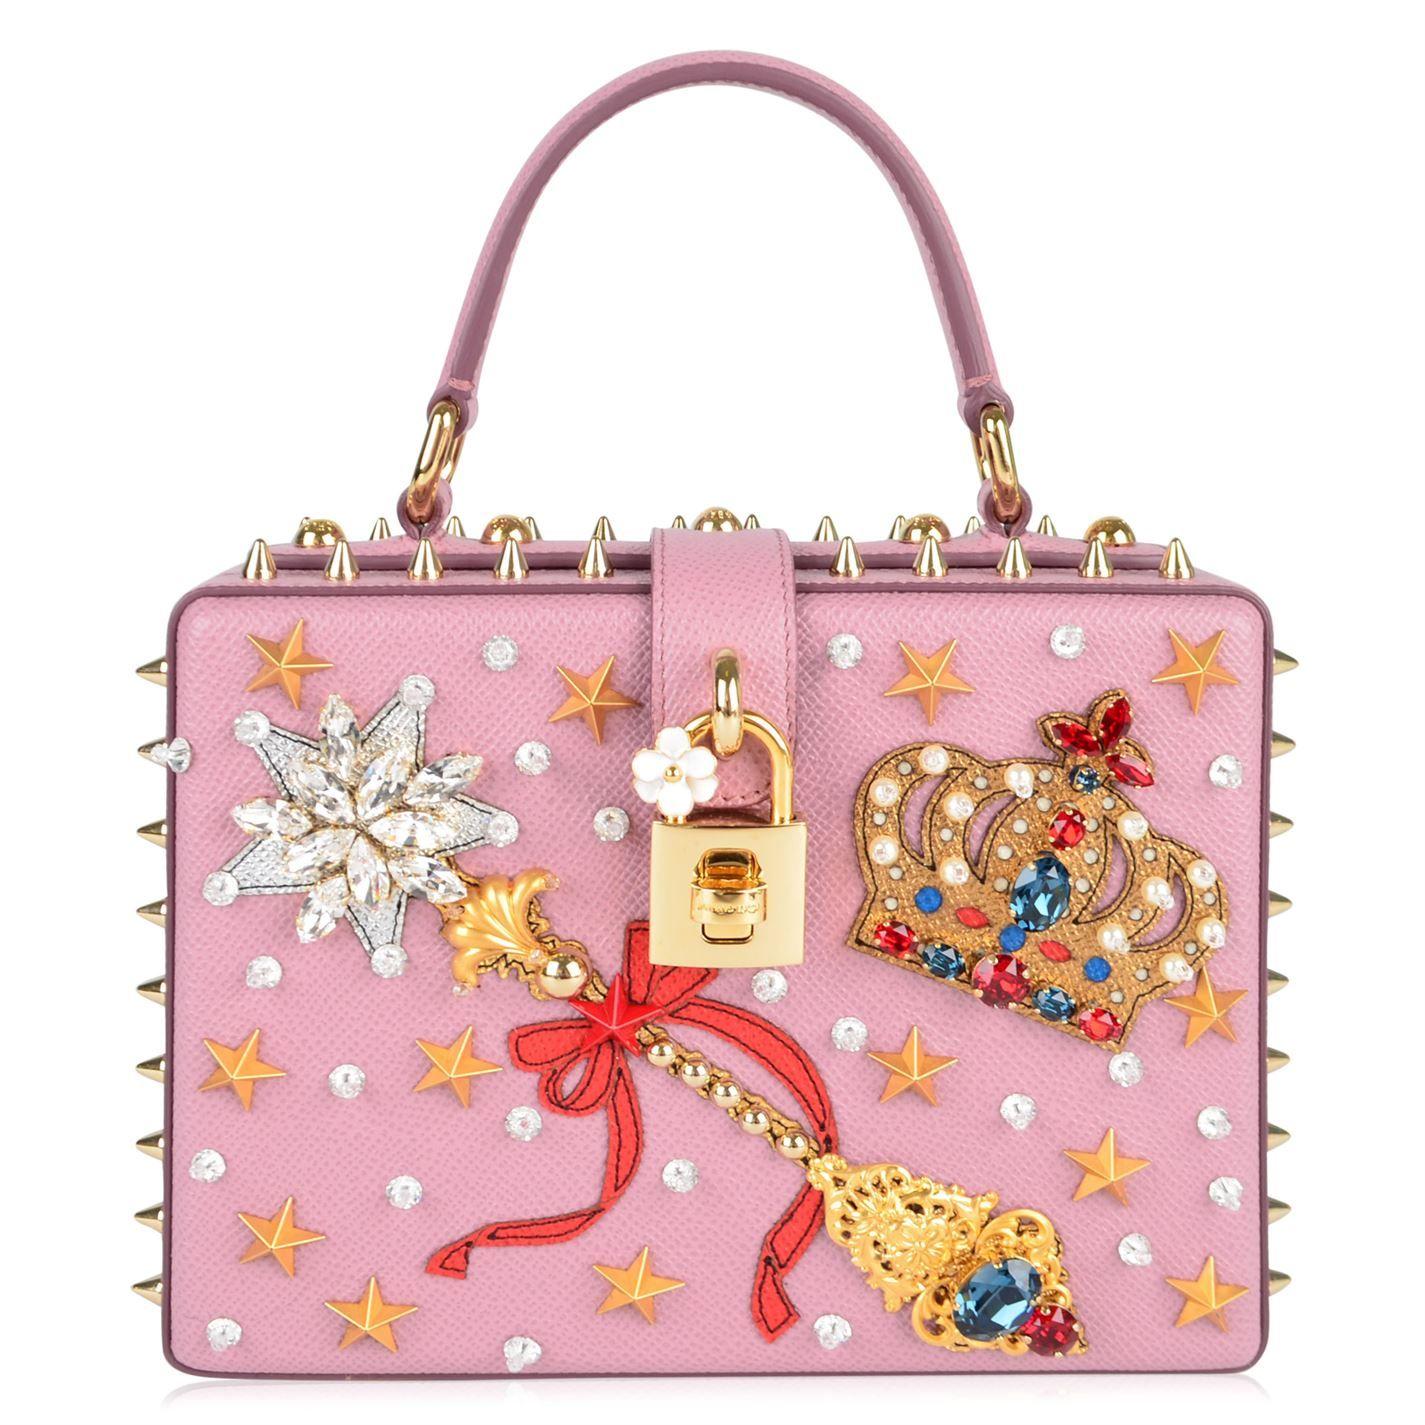 29b62603b8c ... Dolce and Gabbana St Dauphine Patch Box Bag finest selection da453  87101 ...